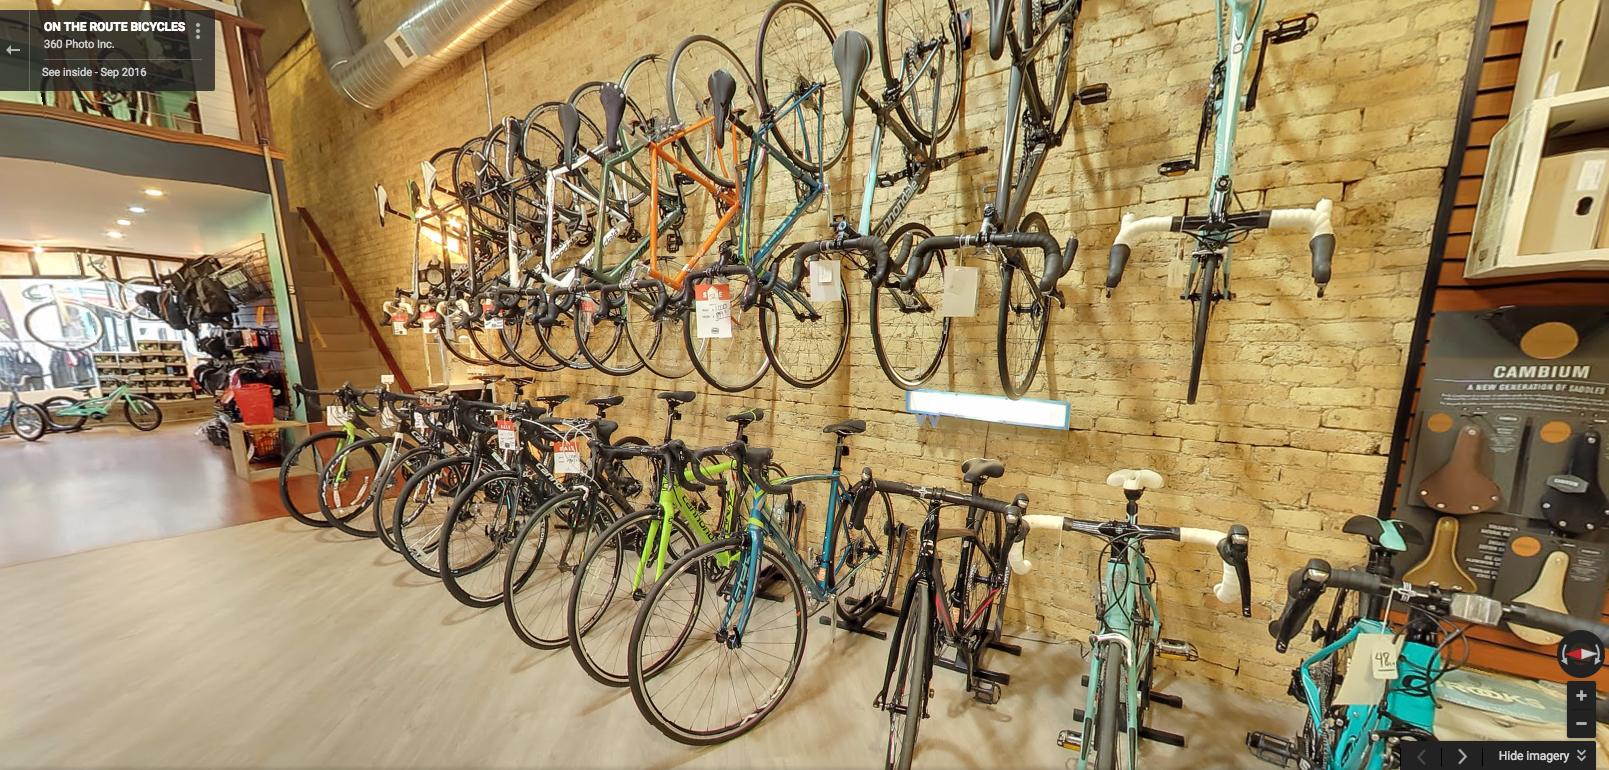 203e5c381ea On The Route Bicycles, Bike shop, Bike repair, Bike sales, Chicago ...